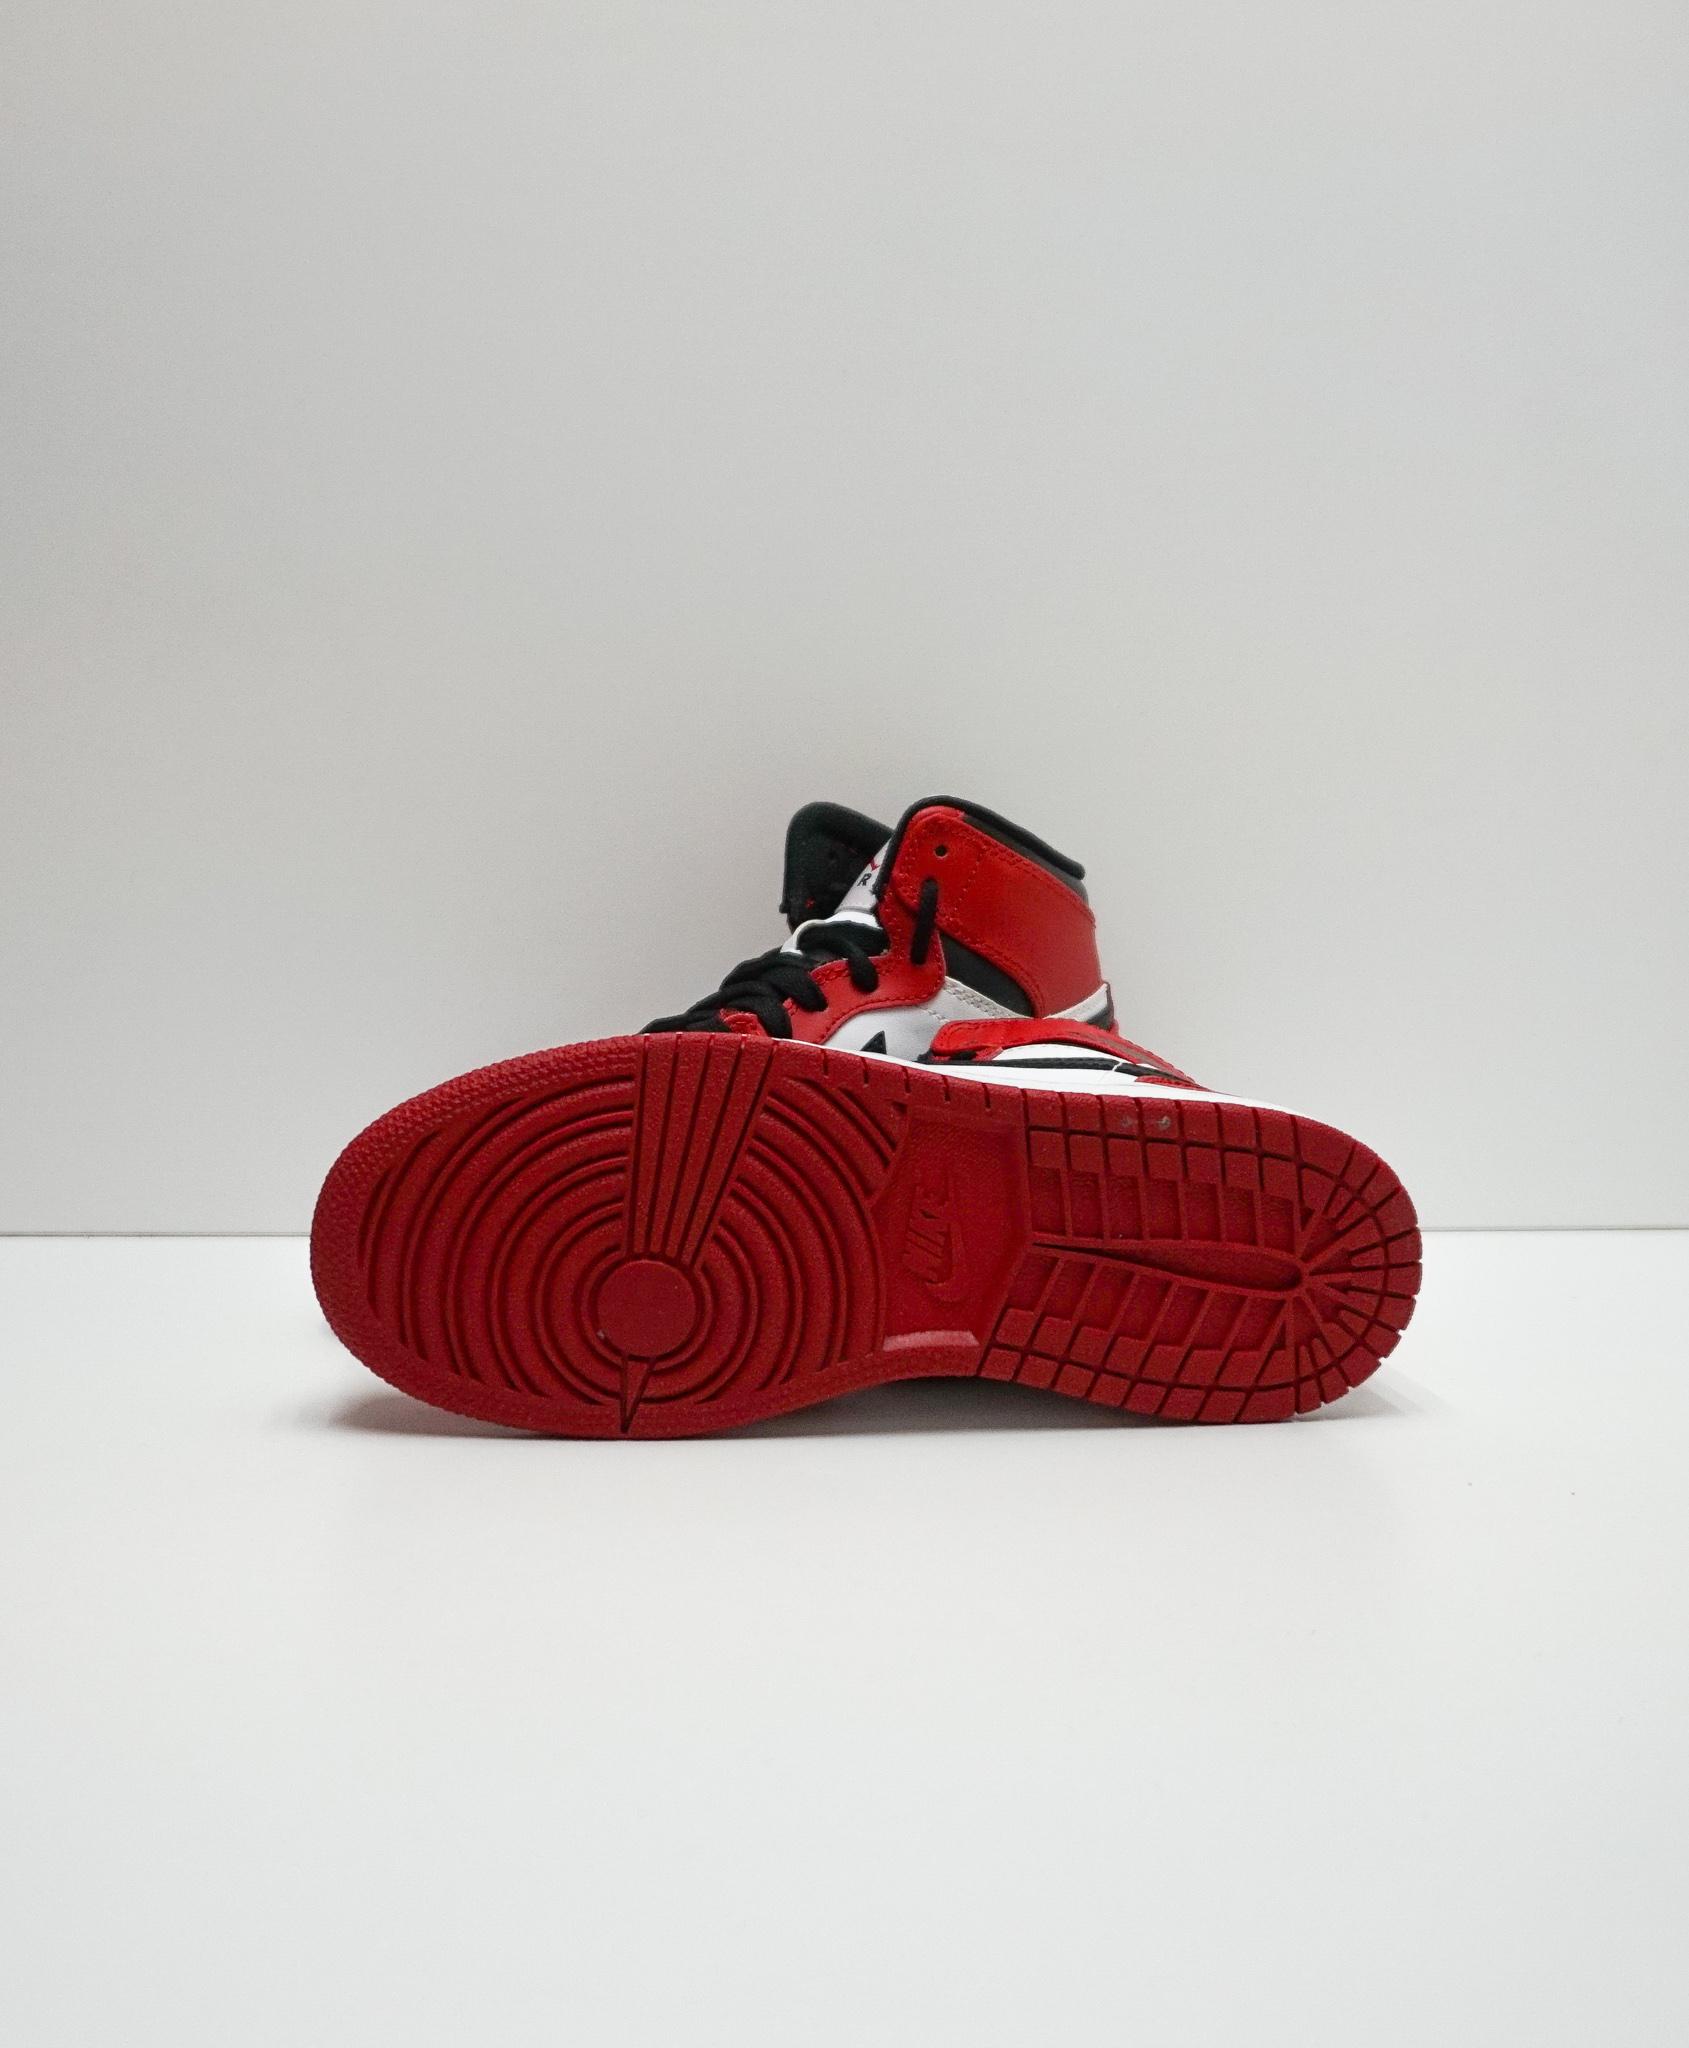 Jordan 1 Chicago (GS)